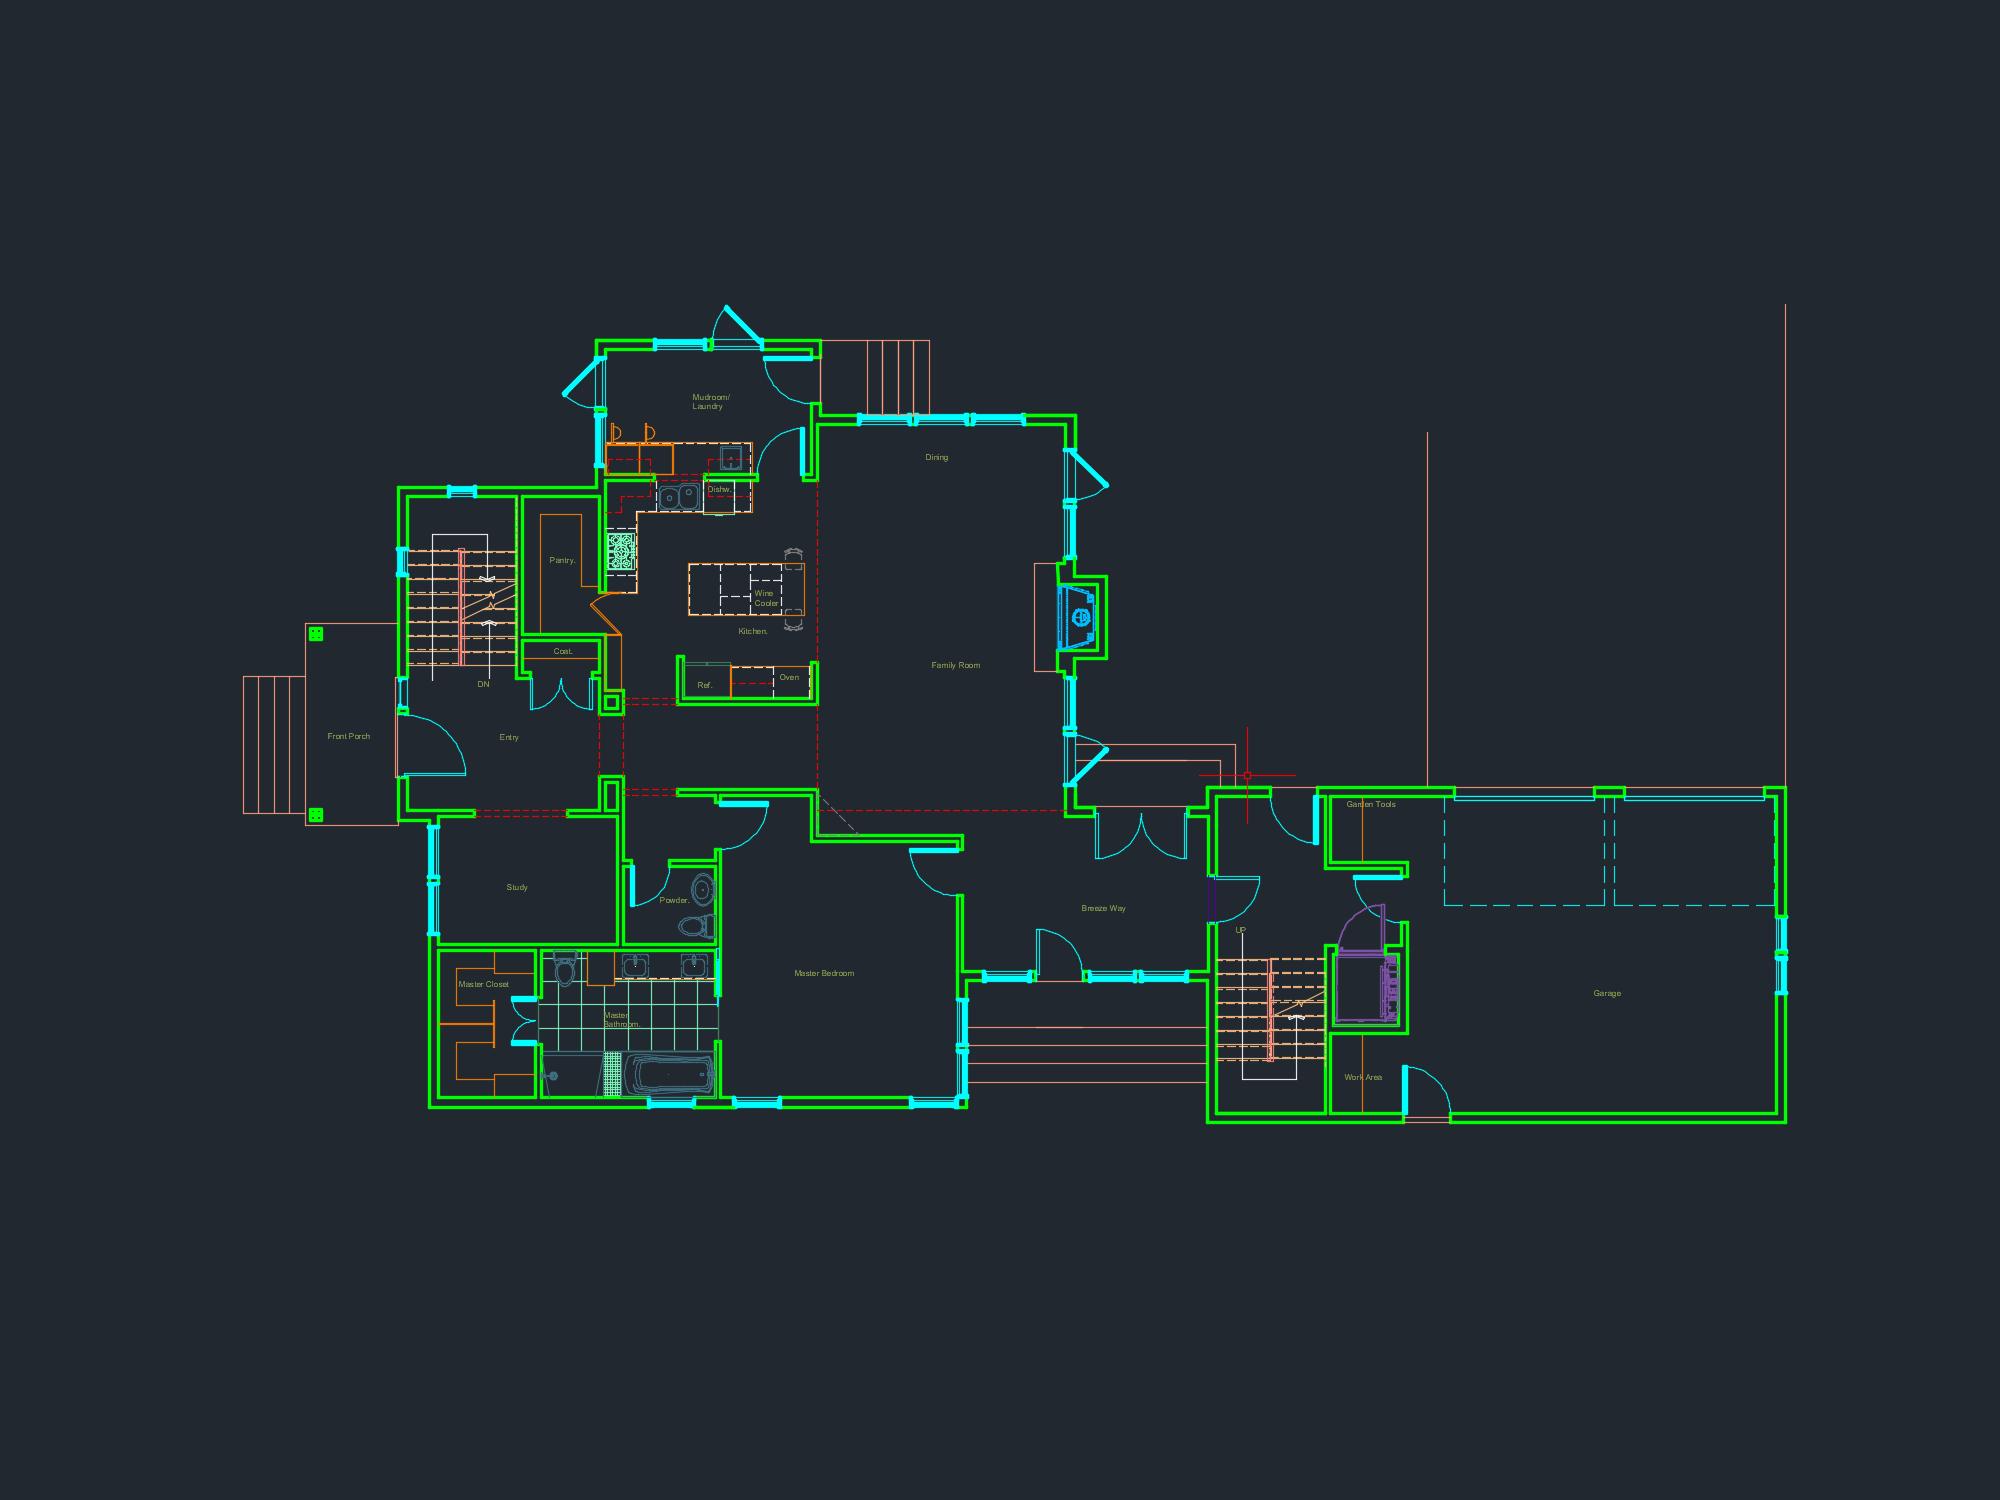 Schematic Design - Developing the Floor Plan